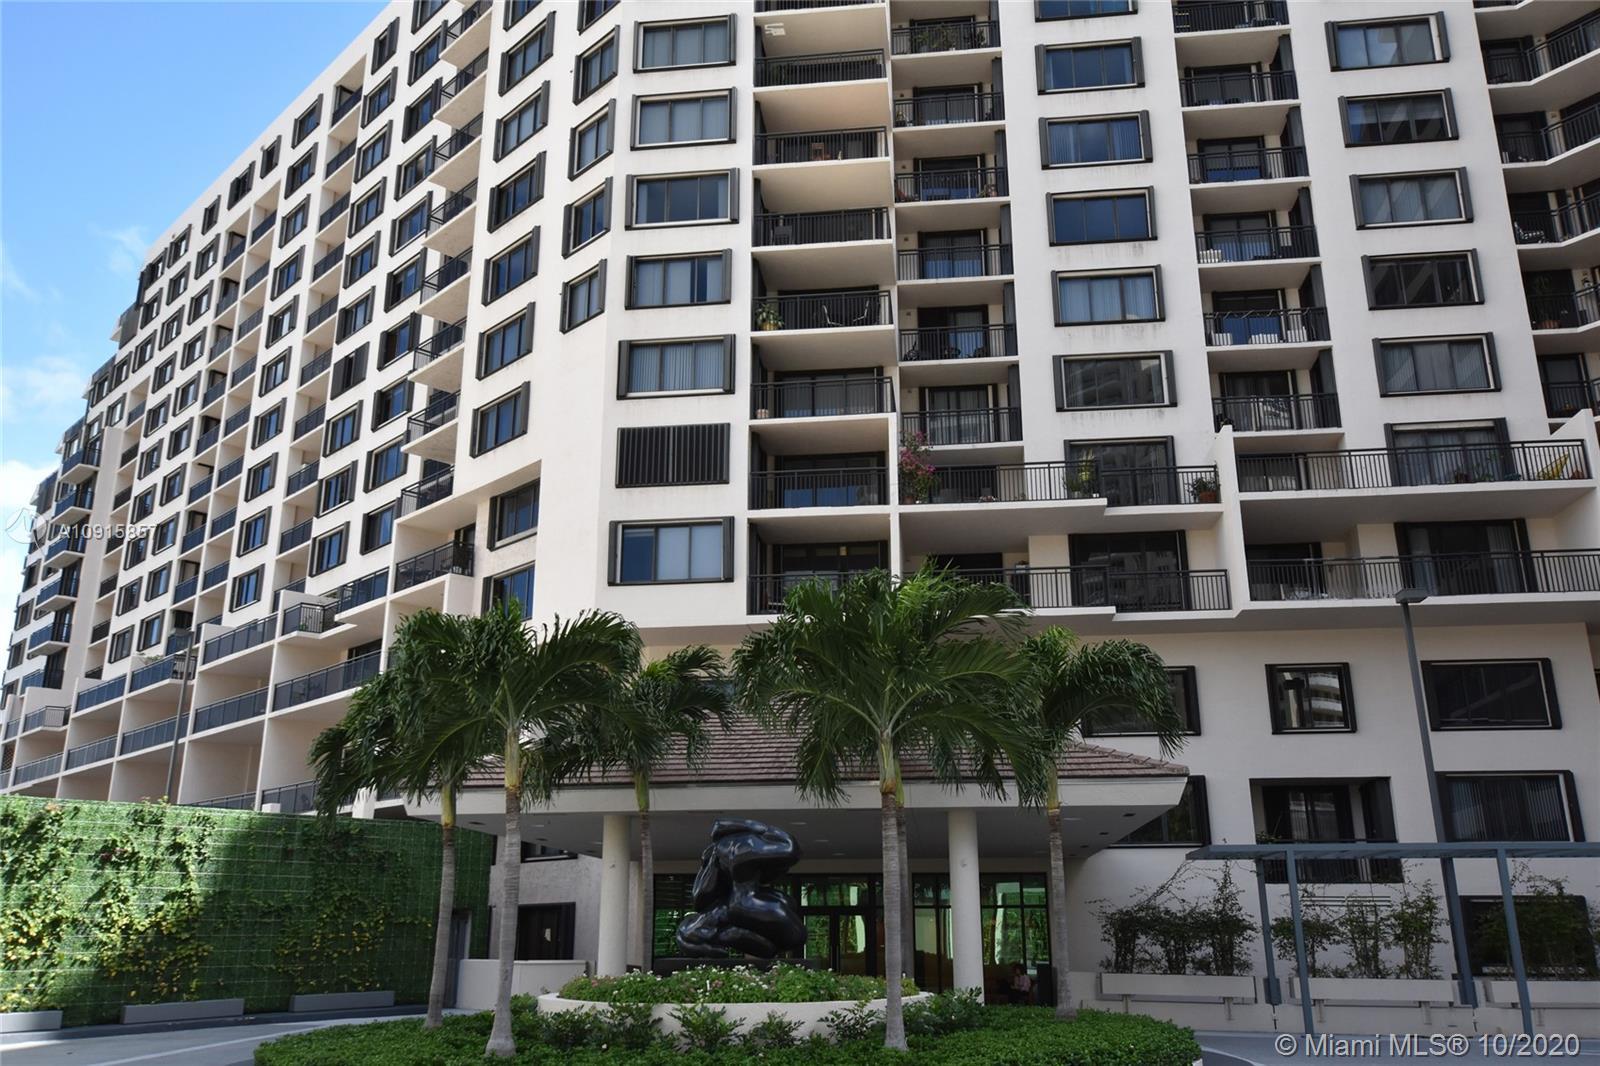 Brickell Key Two #902 - 540 BRICKELL KEY DR #902, Miami, FL 33131